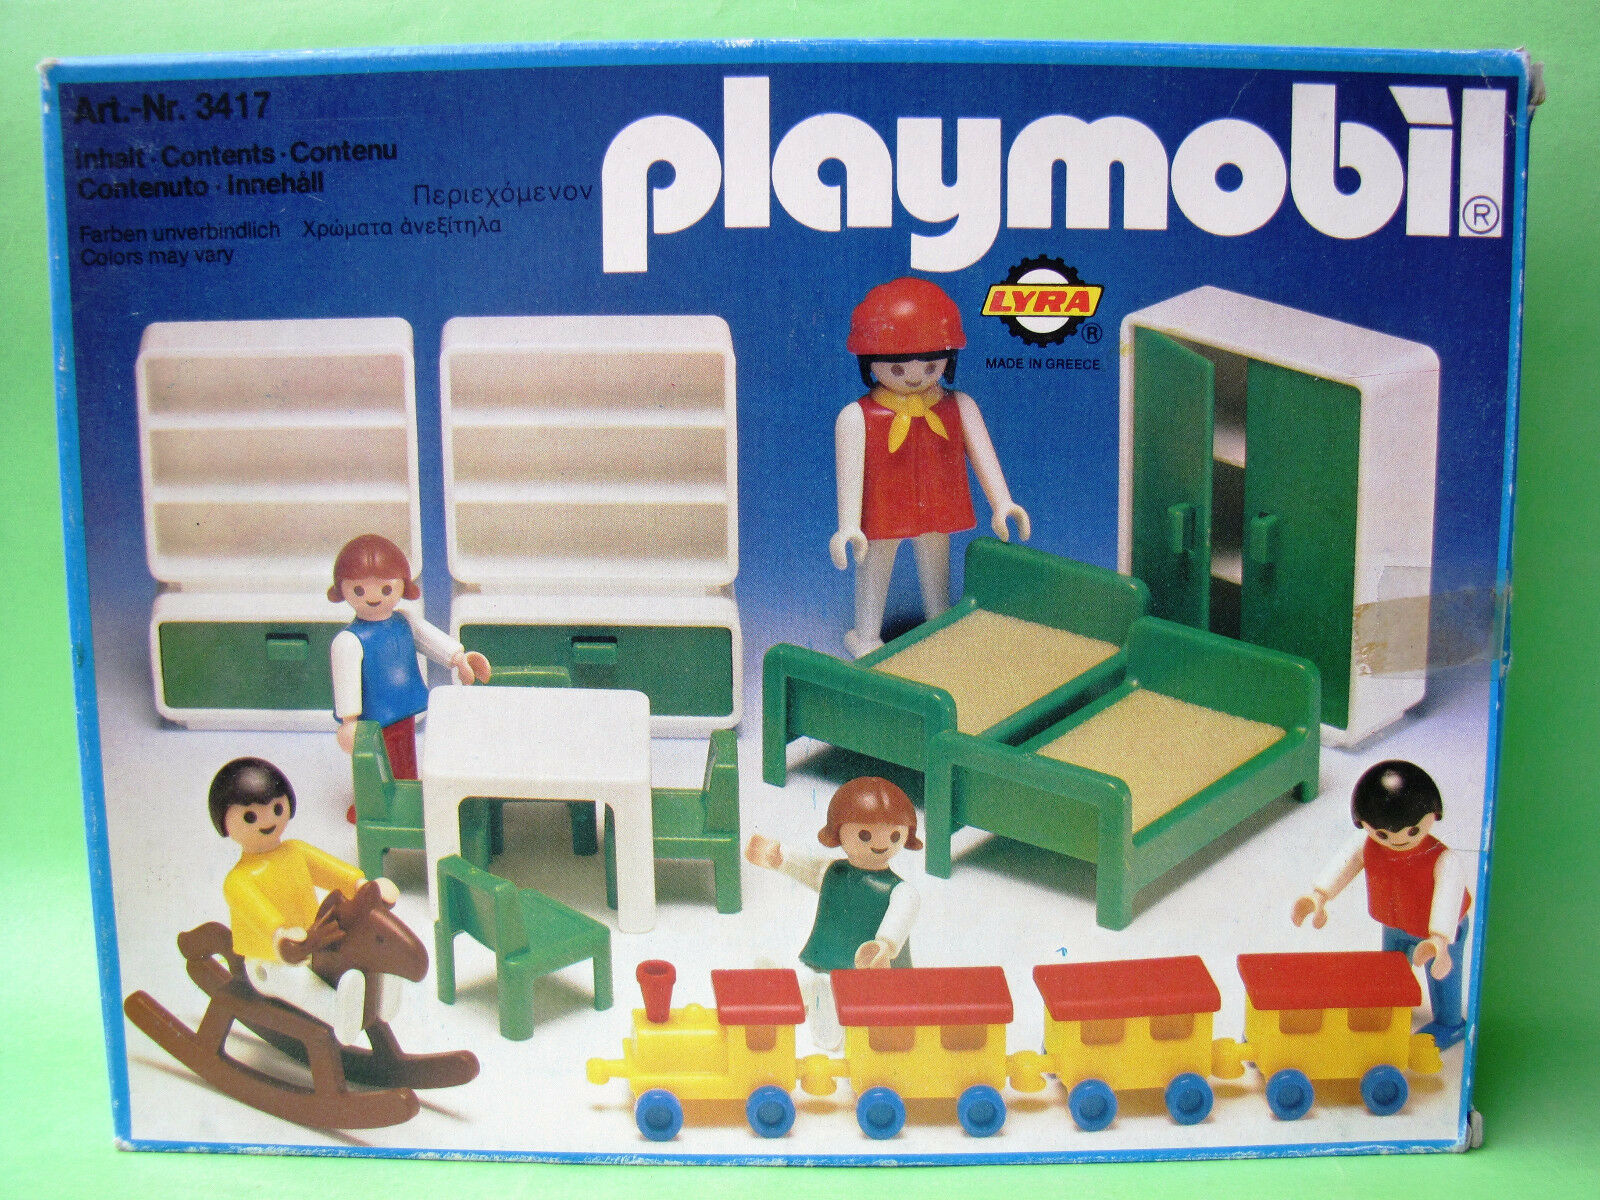 Playmobil Lyra  1976 bambini Room 3417 MIB Geobra Brestätter & Co OVP  prezzi bassi